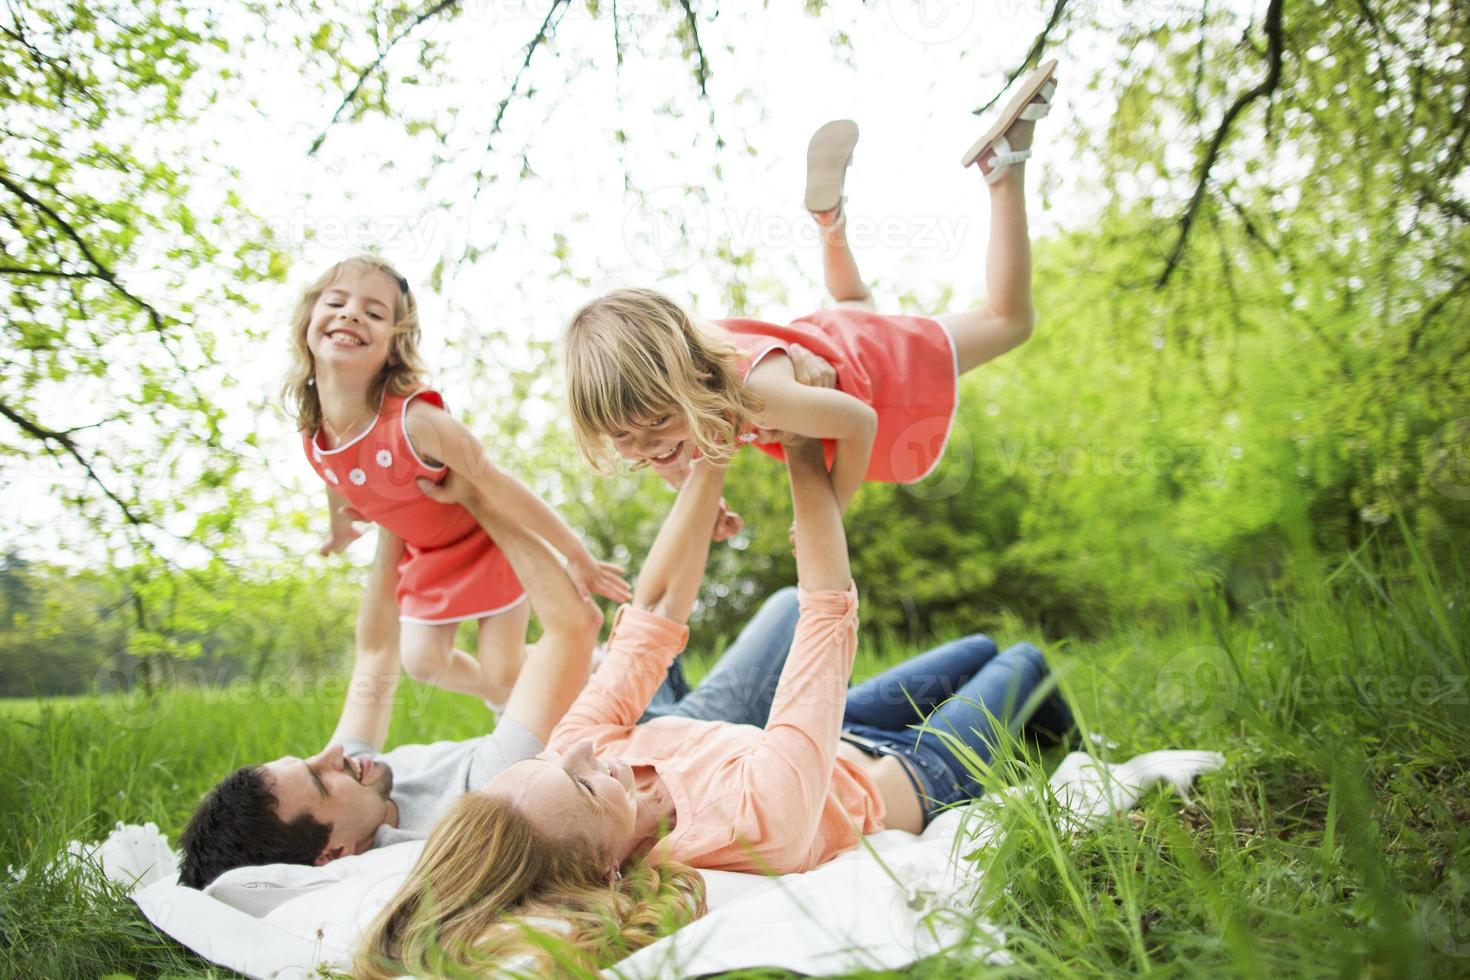 familia feliz haciendo picnic en la naturaleza foto